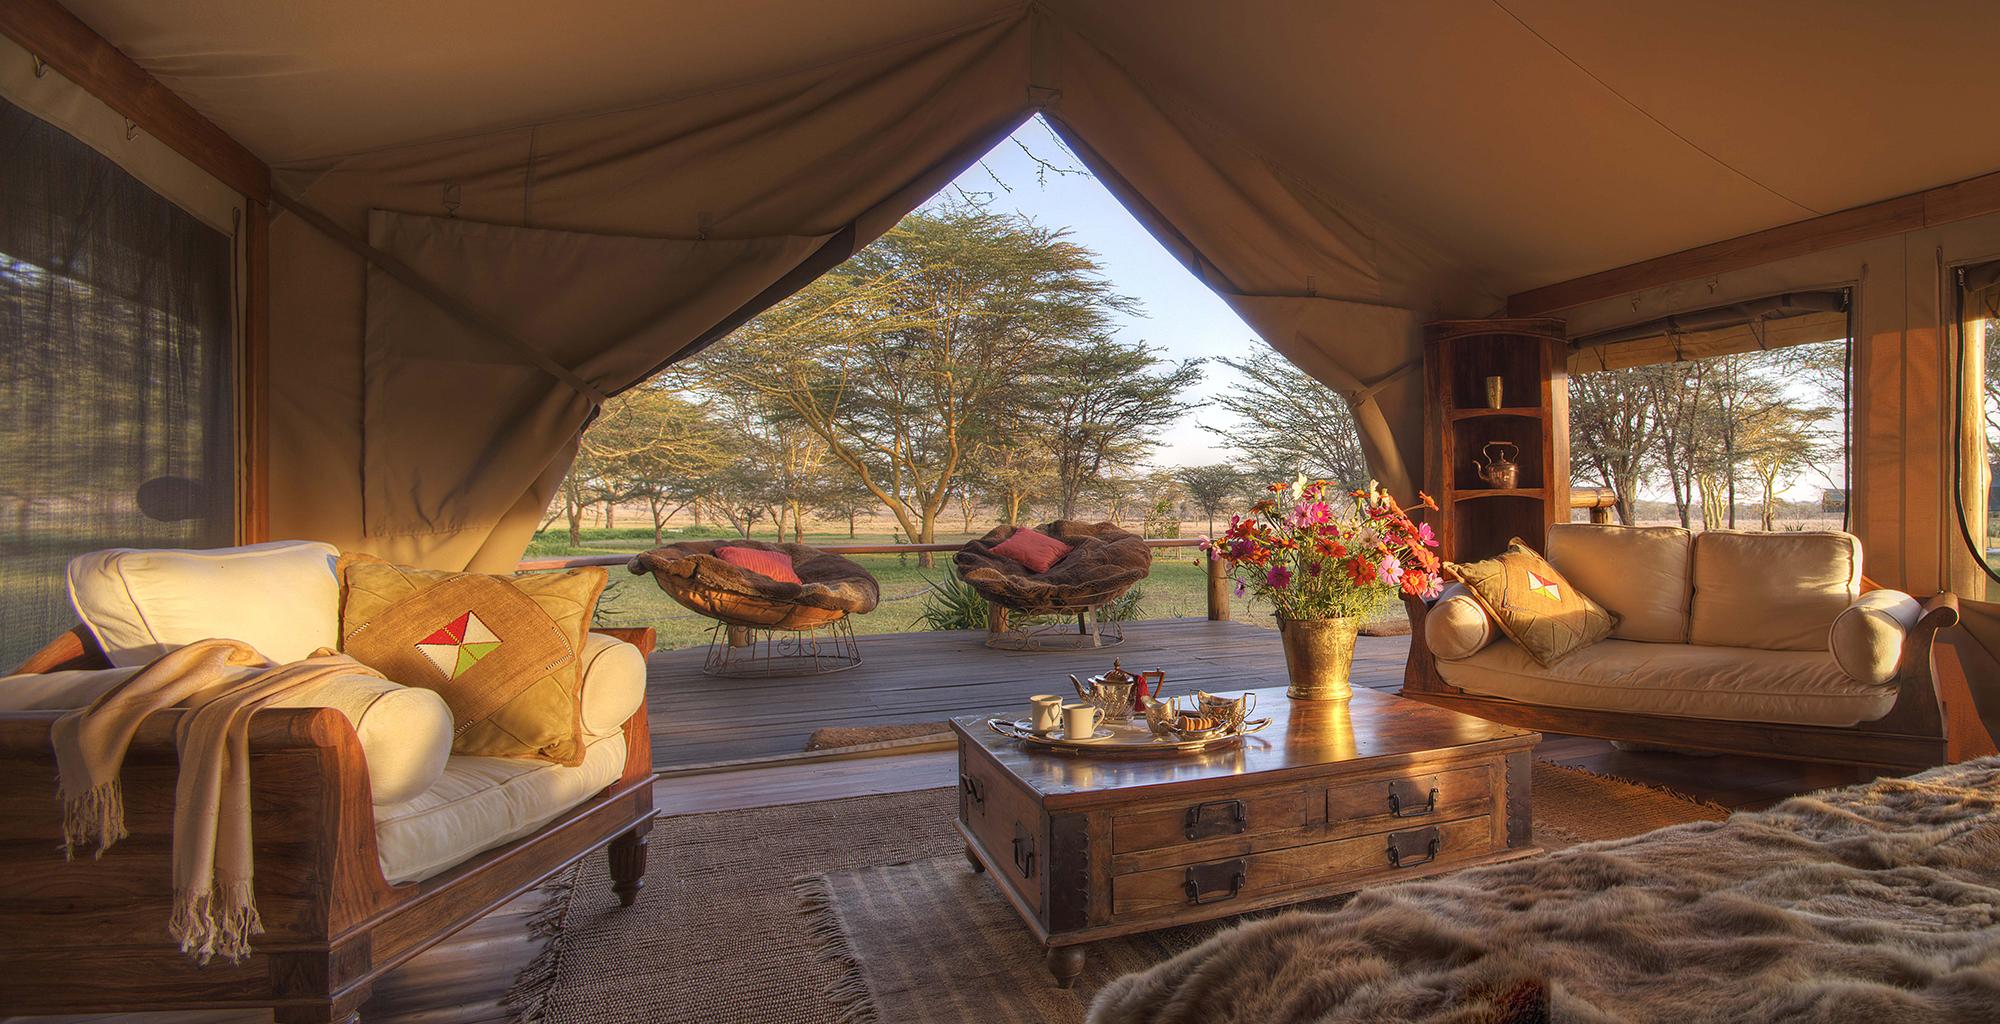 Kenya-Sirikoi-Willies-Camp-Bedroom-View